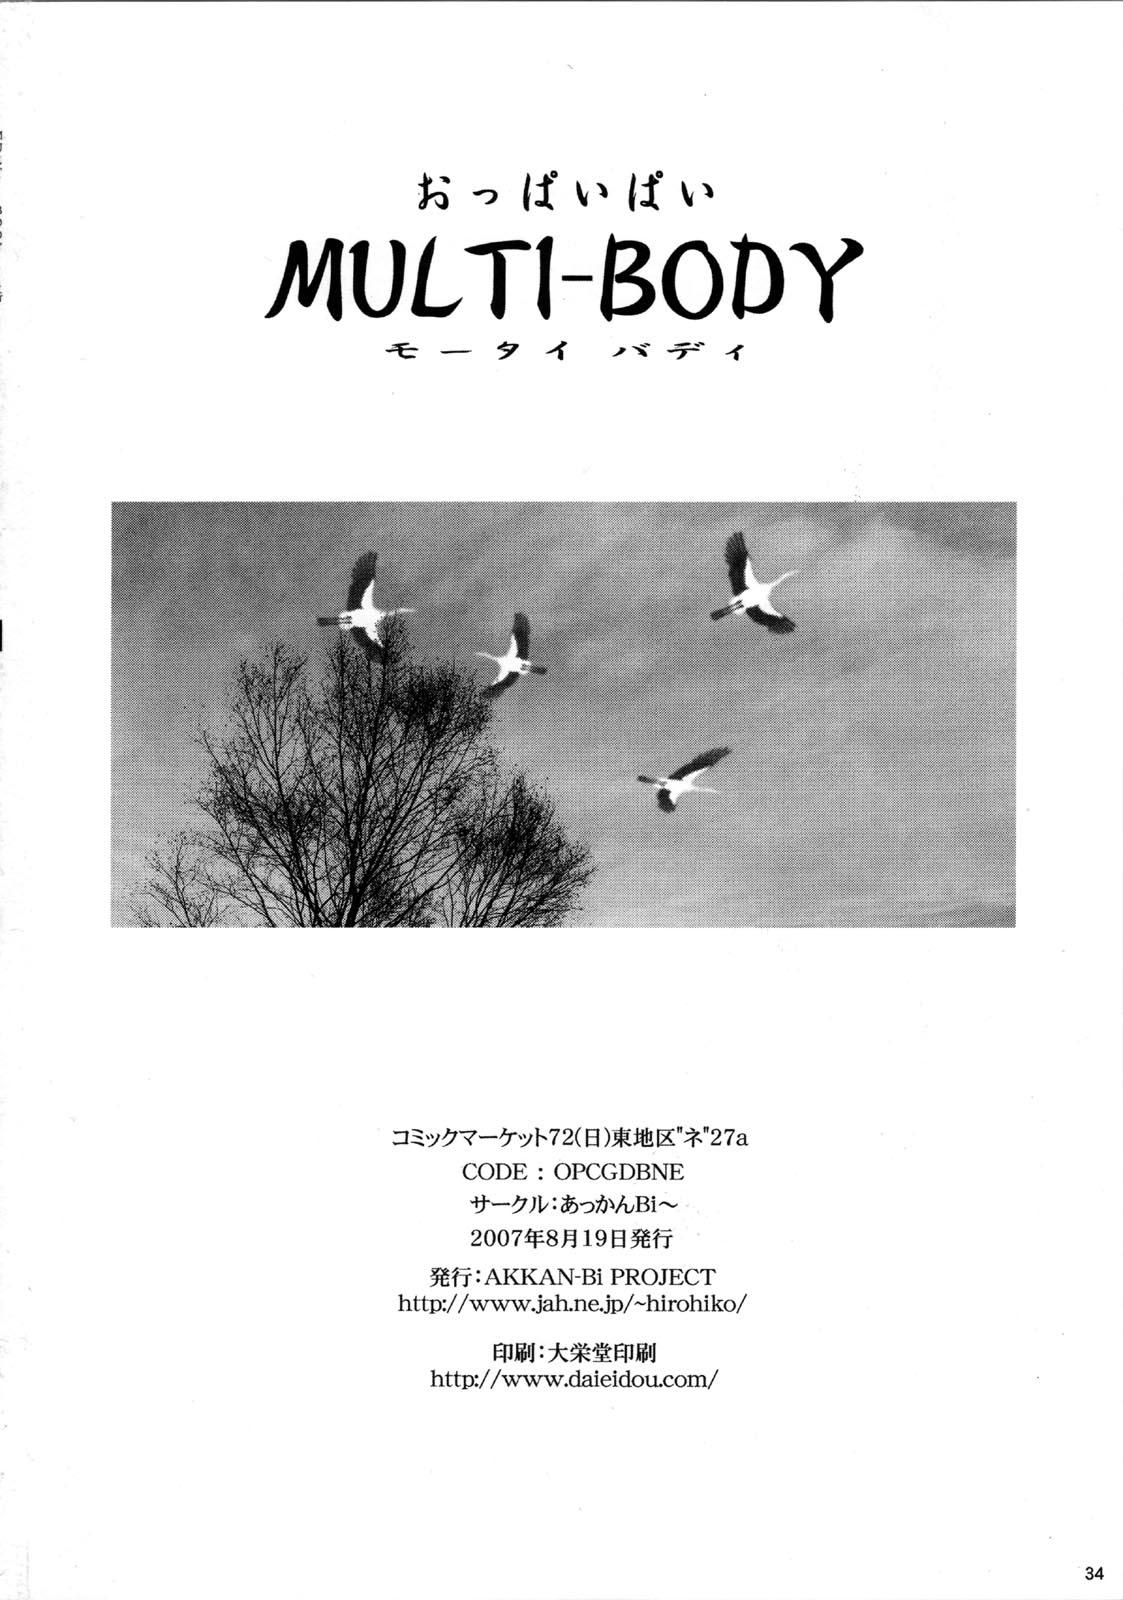 MULTI-BODY 33